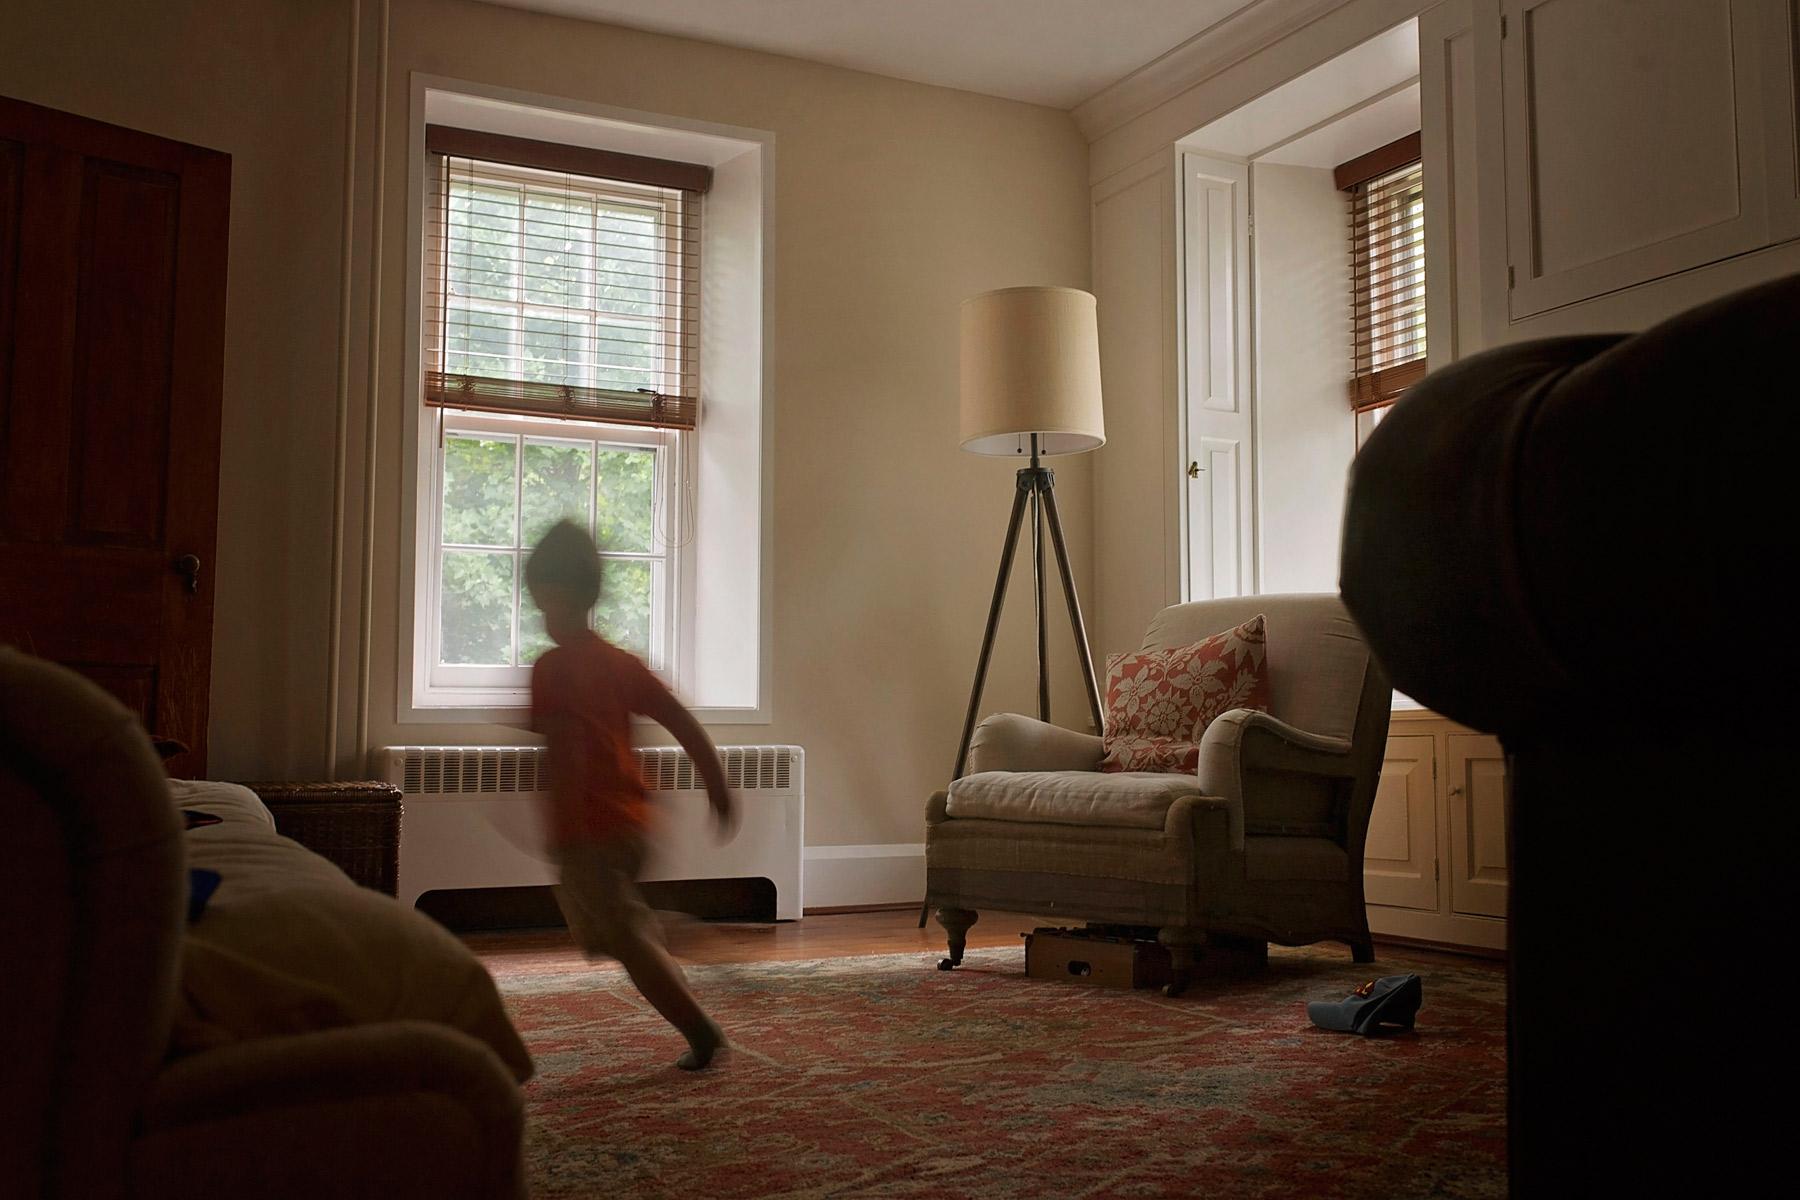 blur of boy running through living room